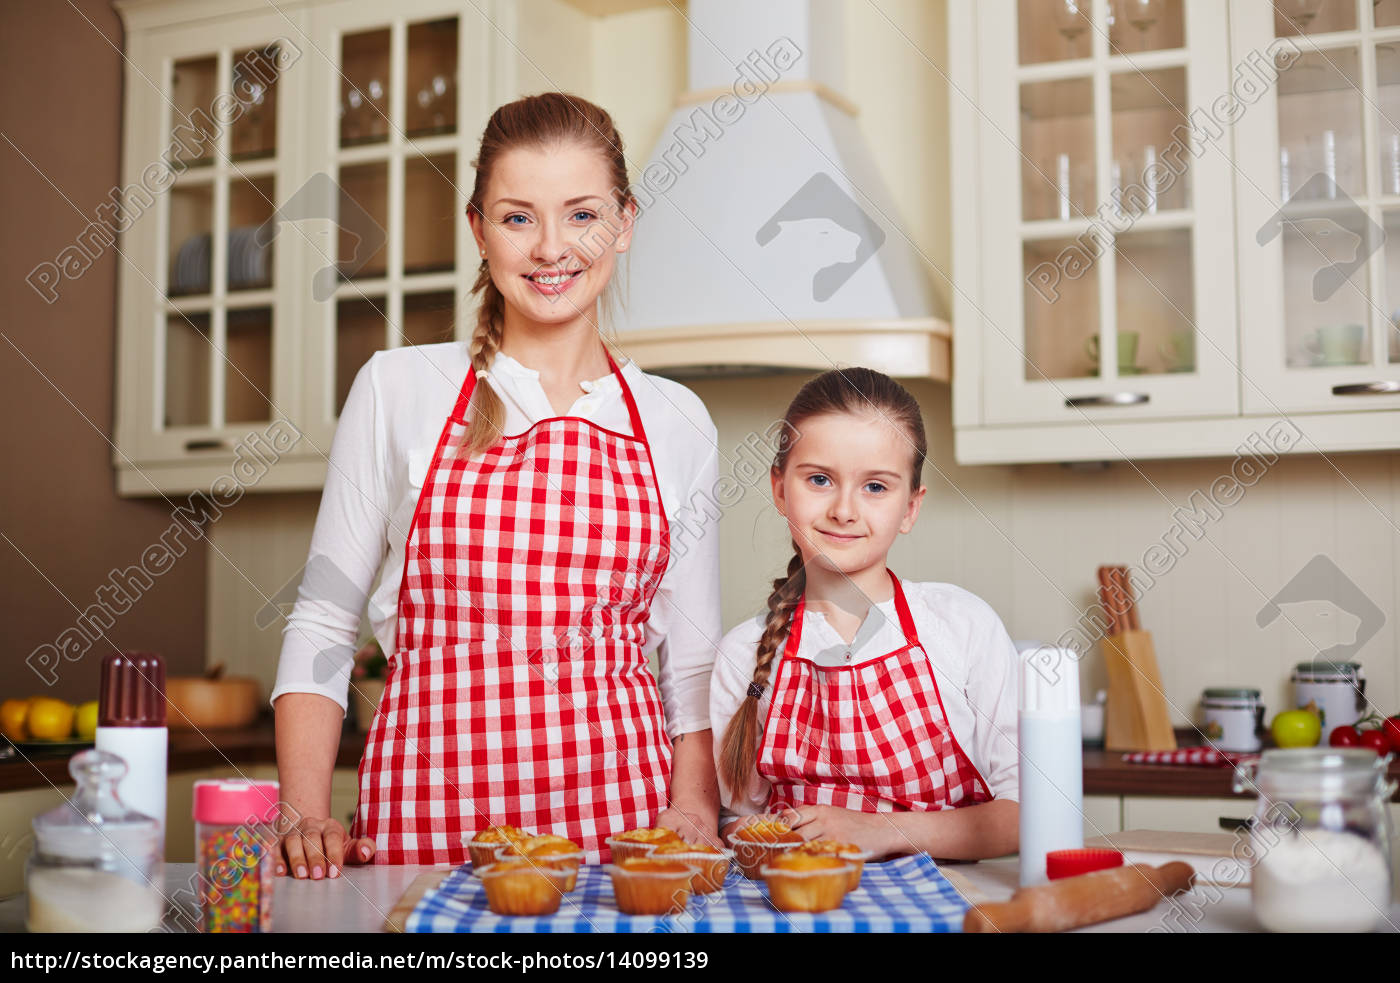 homemade, pastry - 14099139